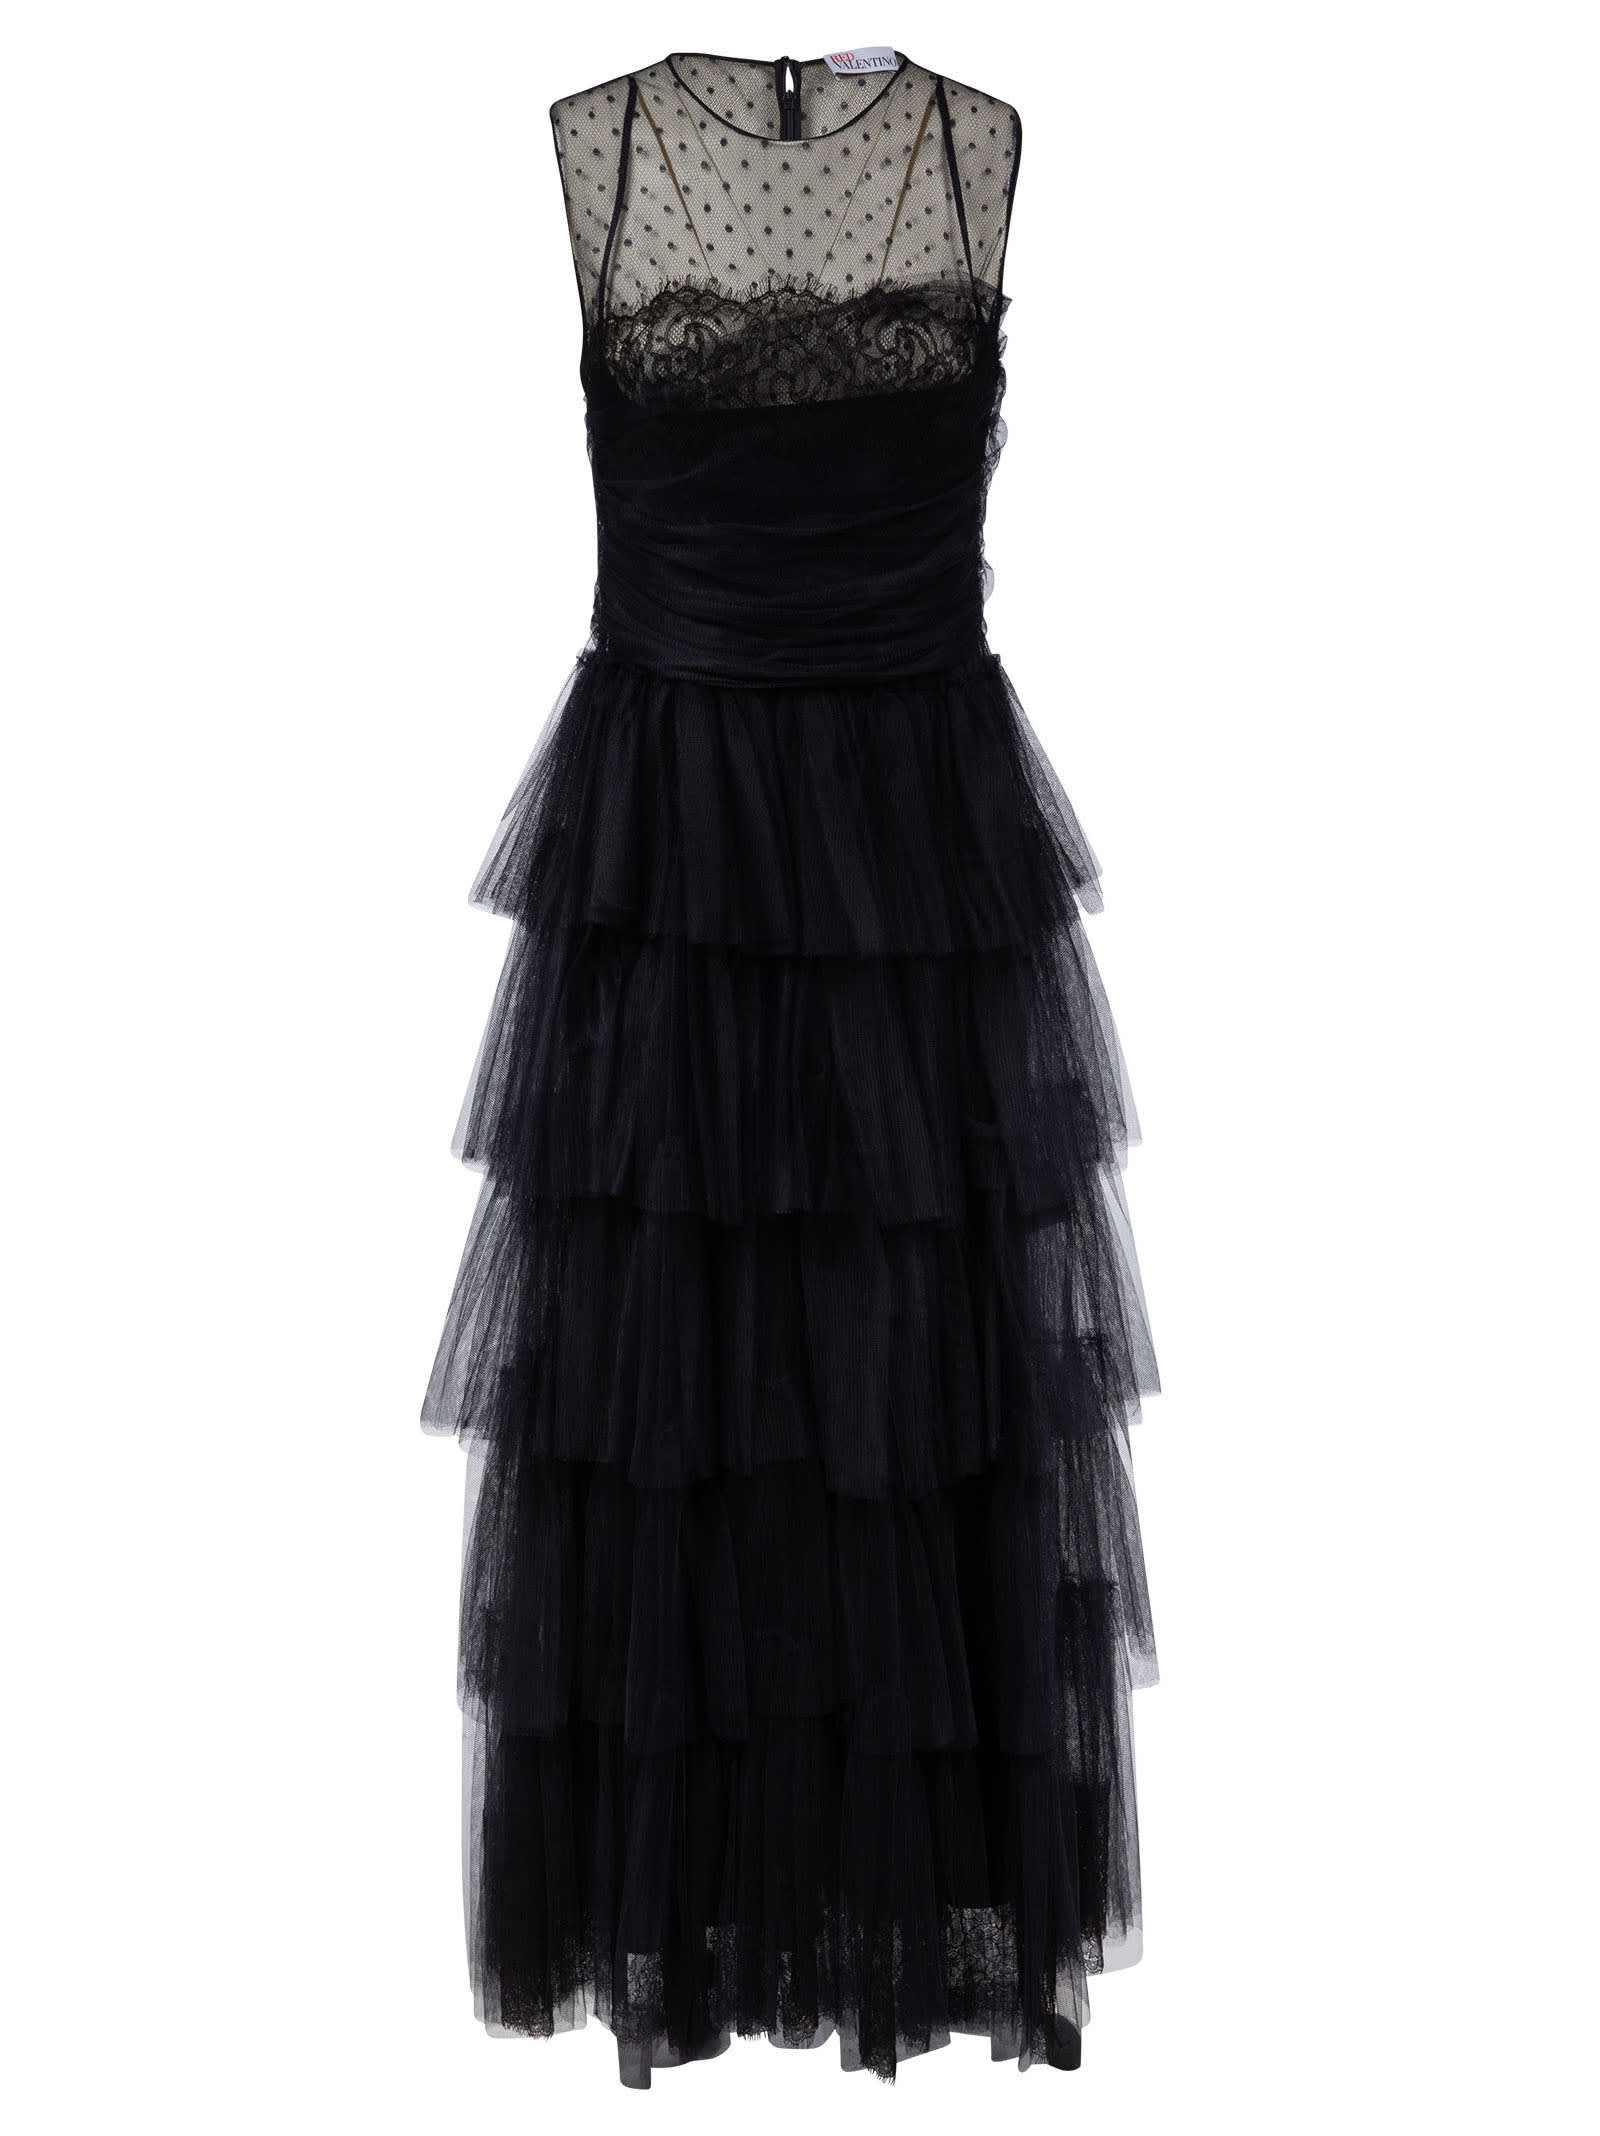 RED Valentino Sleeveless Layered Lace Dress